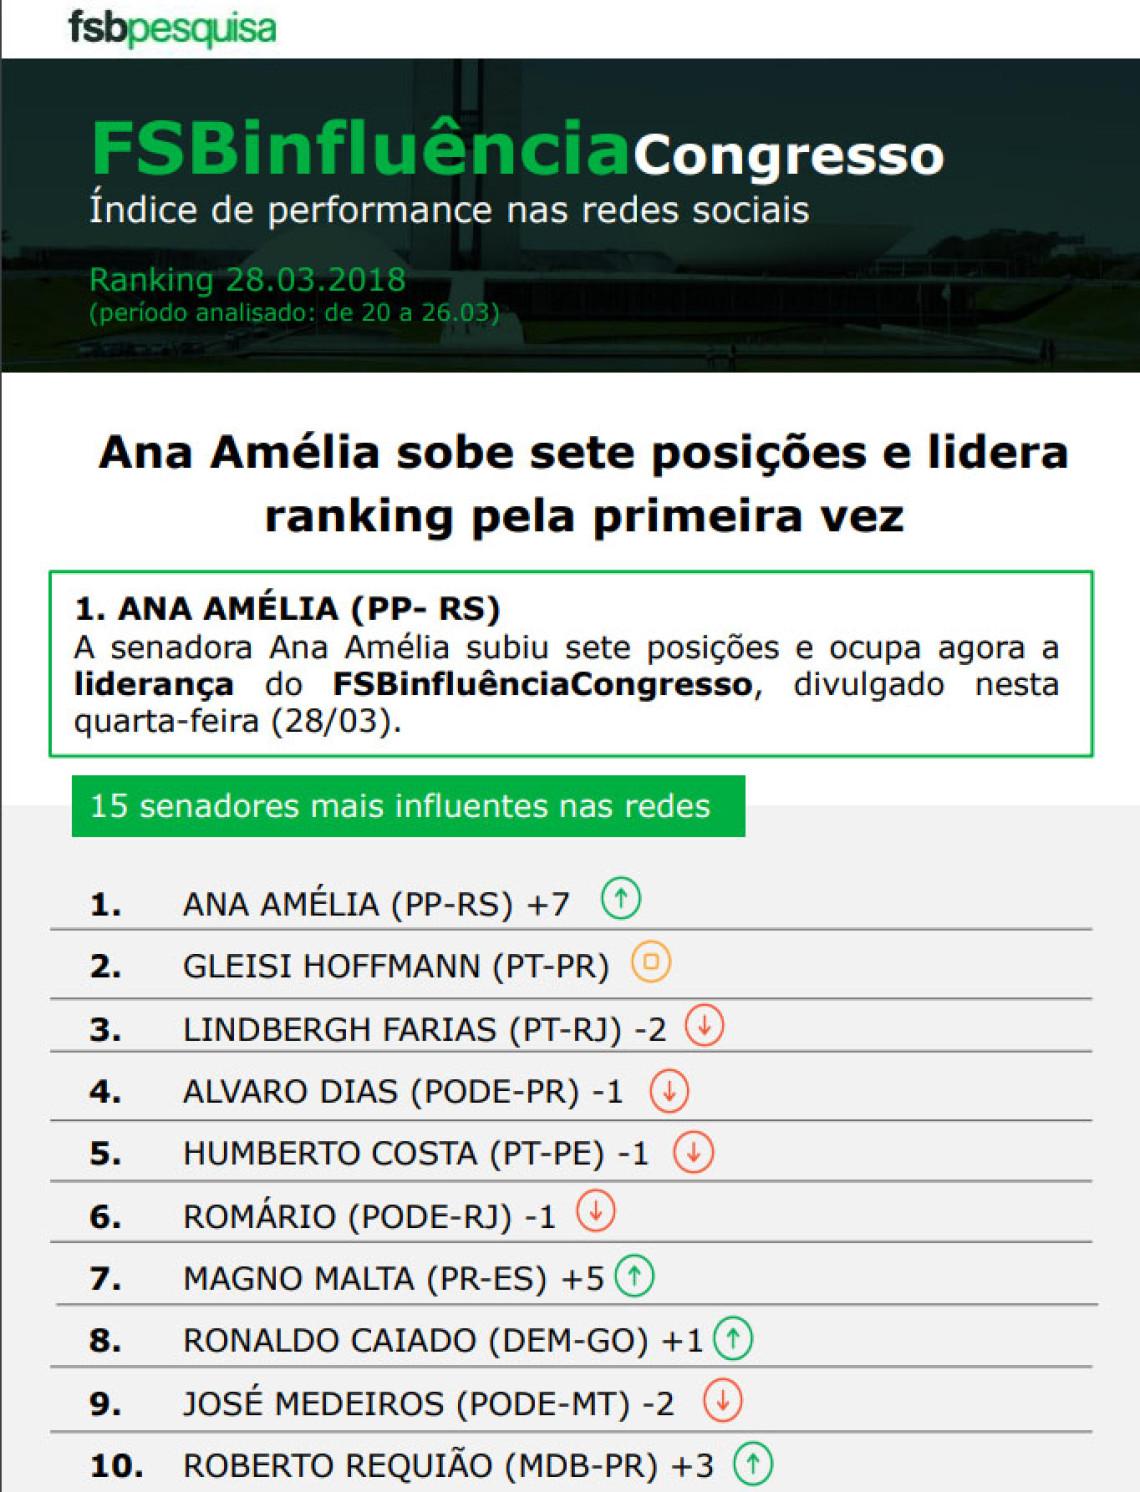 Senadora Ana Amélia lidera índice FSB Influência Congresso